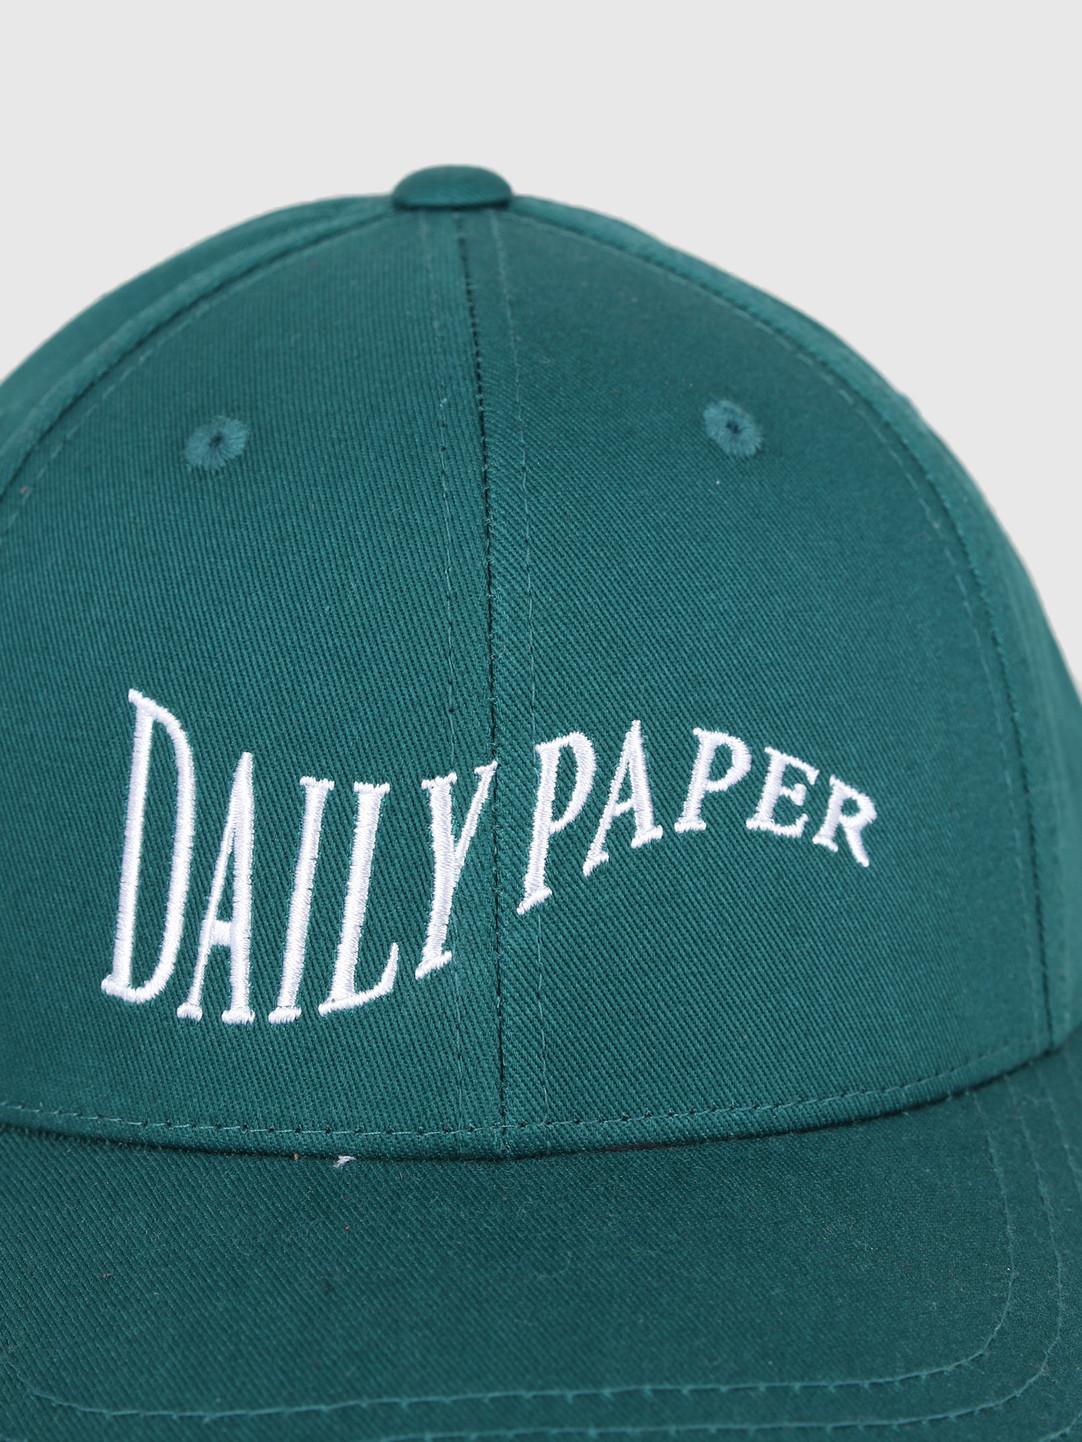 Daily Paper Daily Paper Garp Cap Cadmium Green 19F1AC21-02